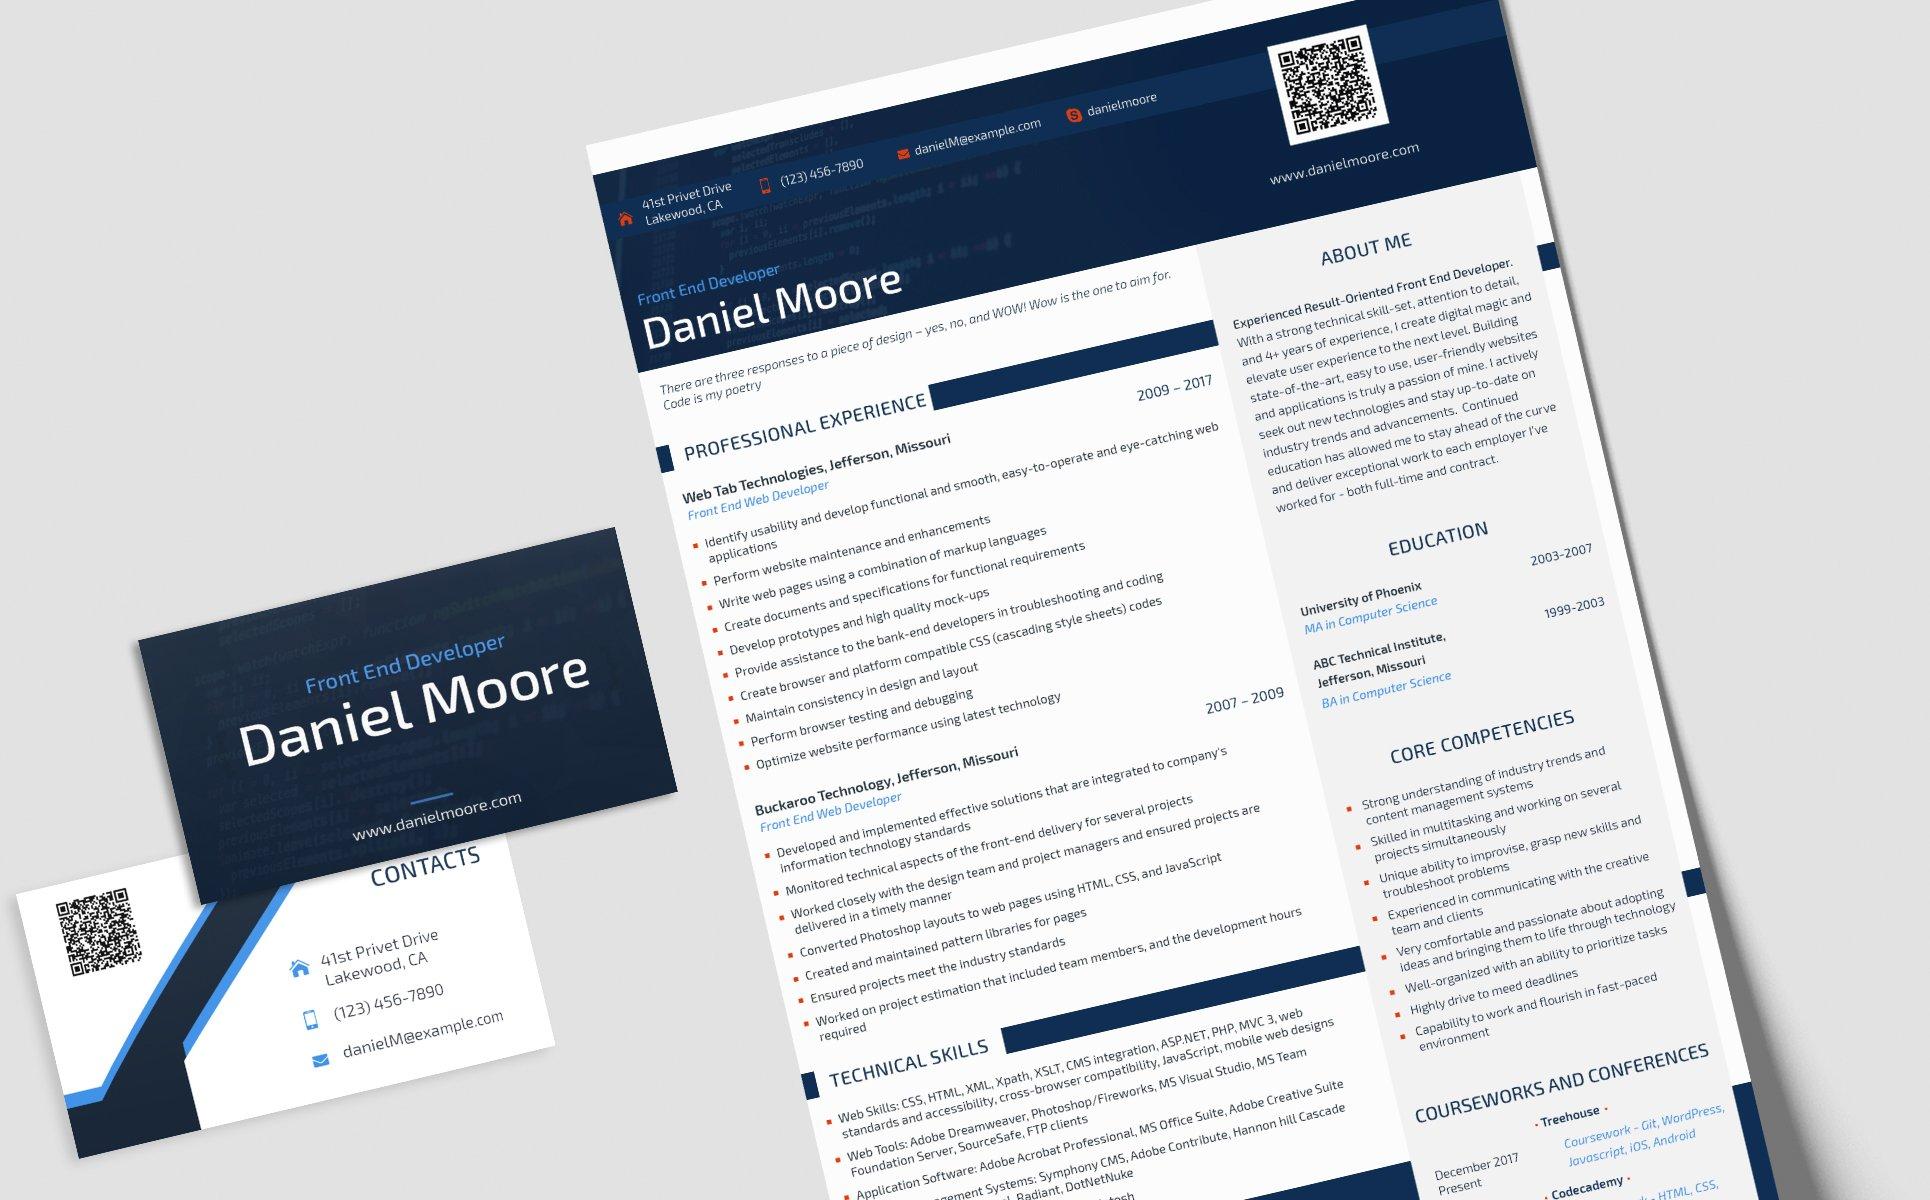 daniel moore front end developer resume template